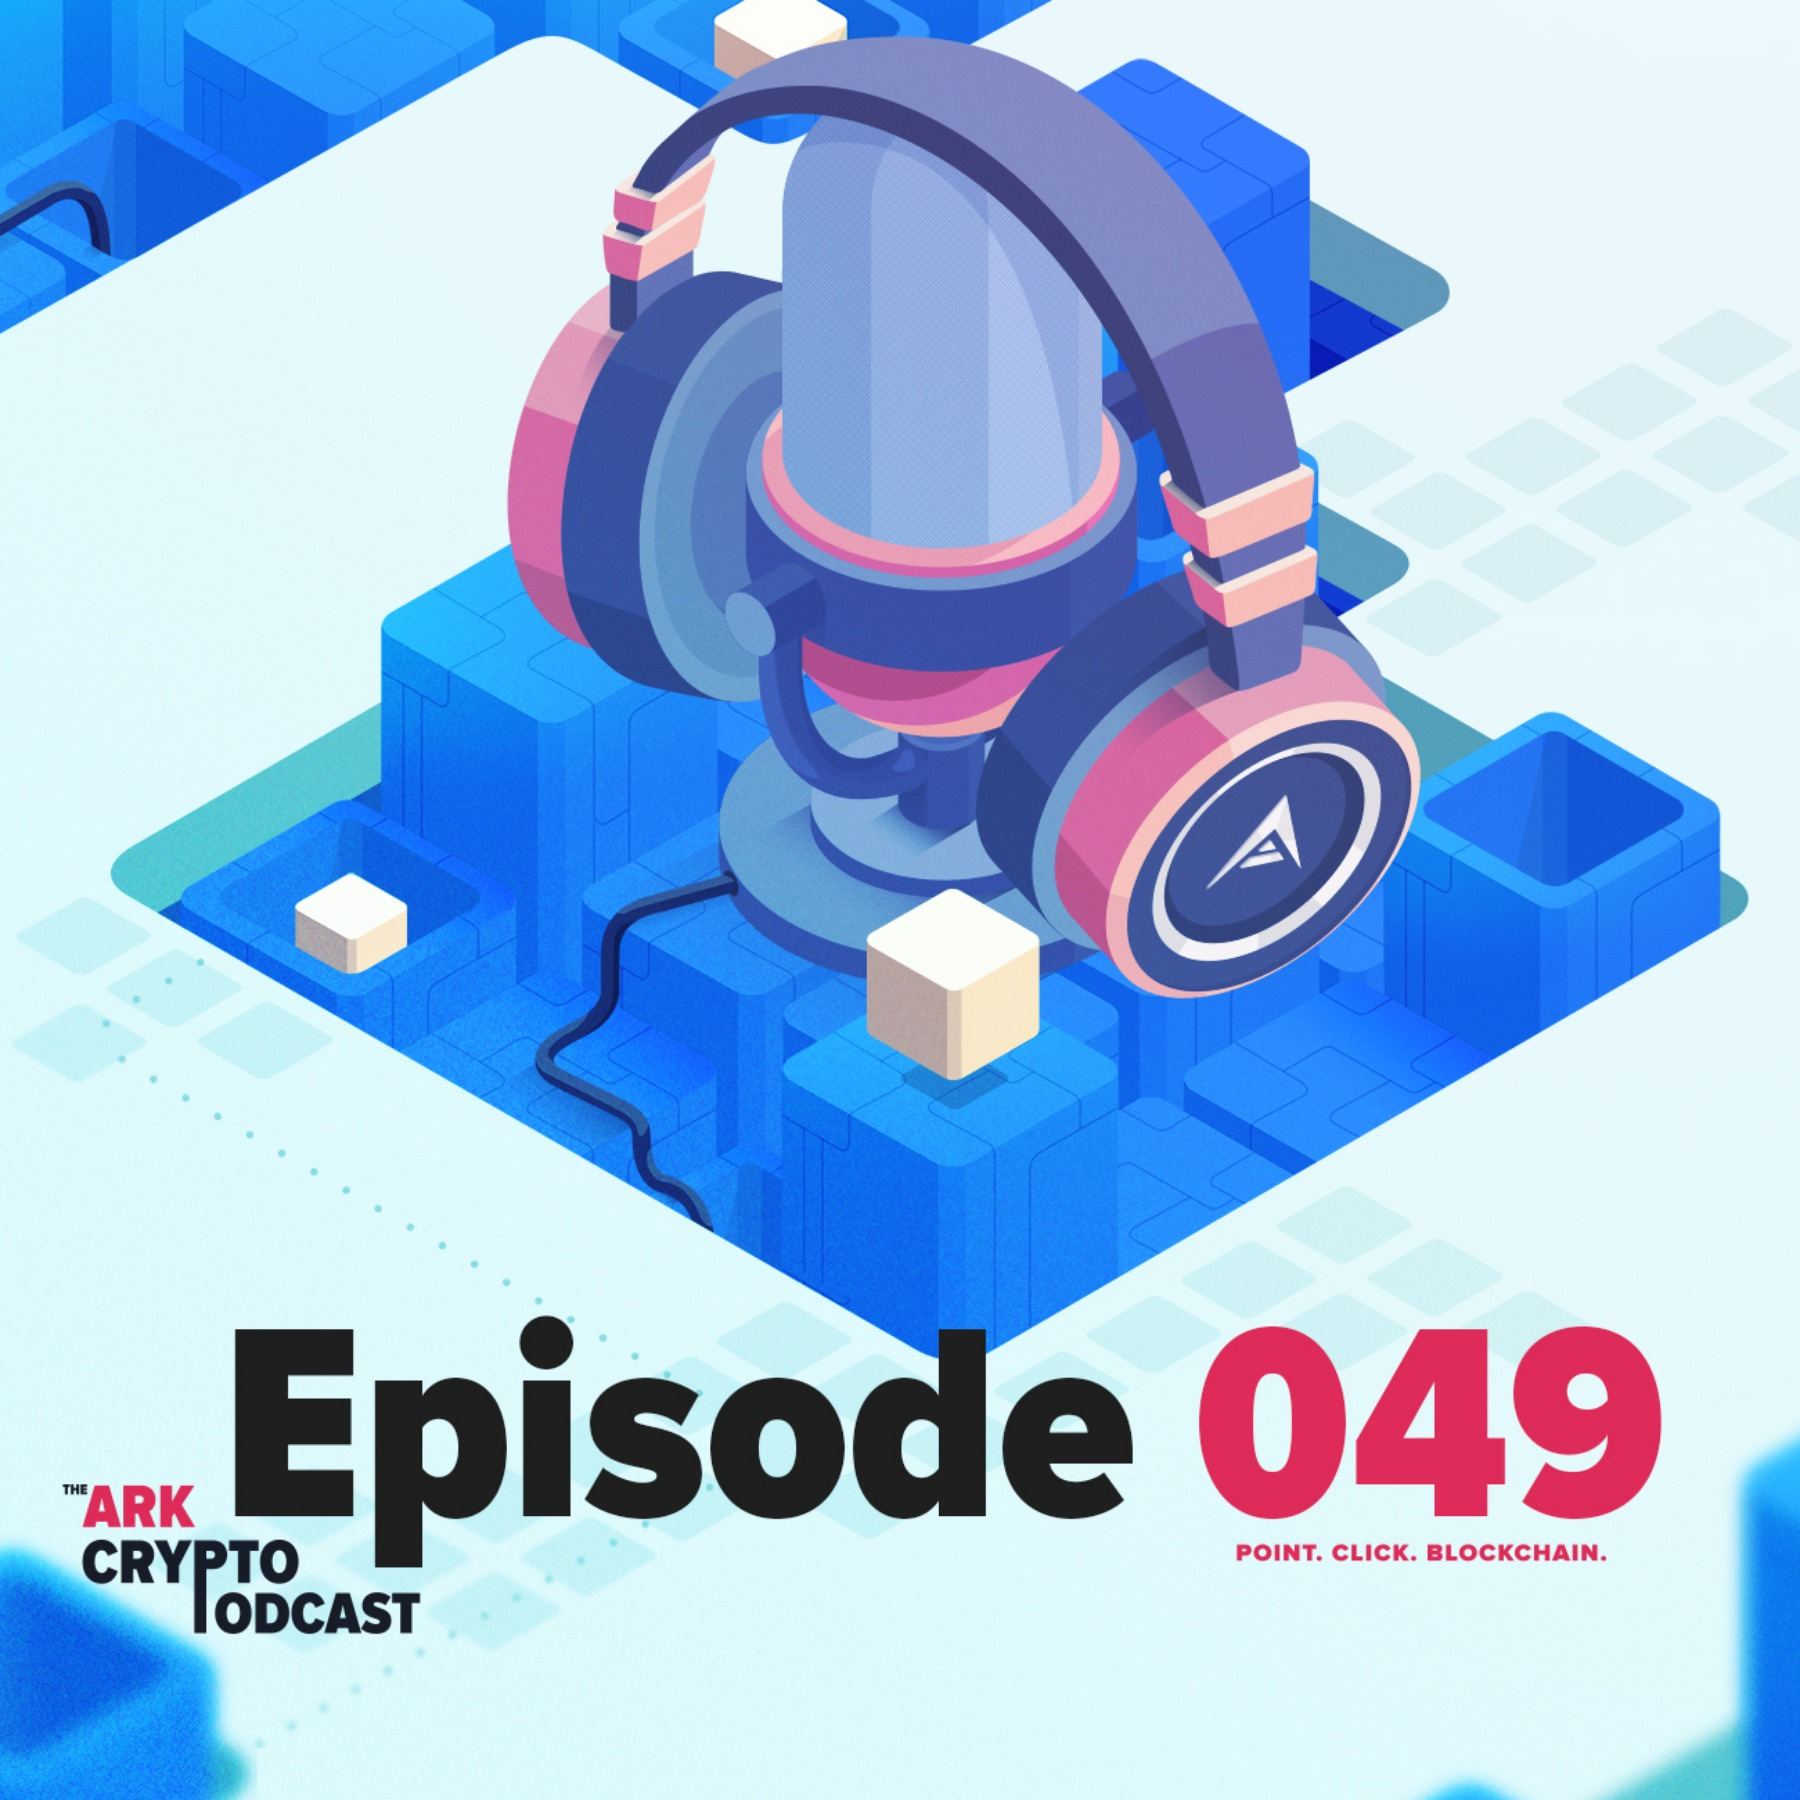 ARK Crypto Podcast #049 - Community Services Appreciation